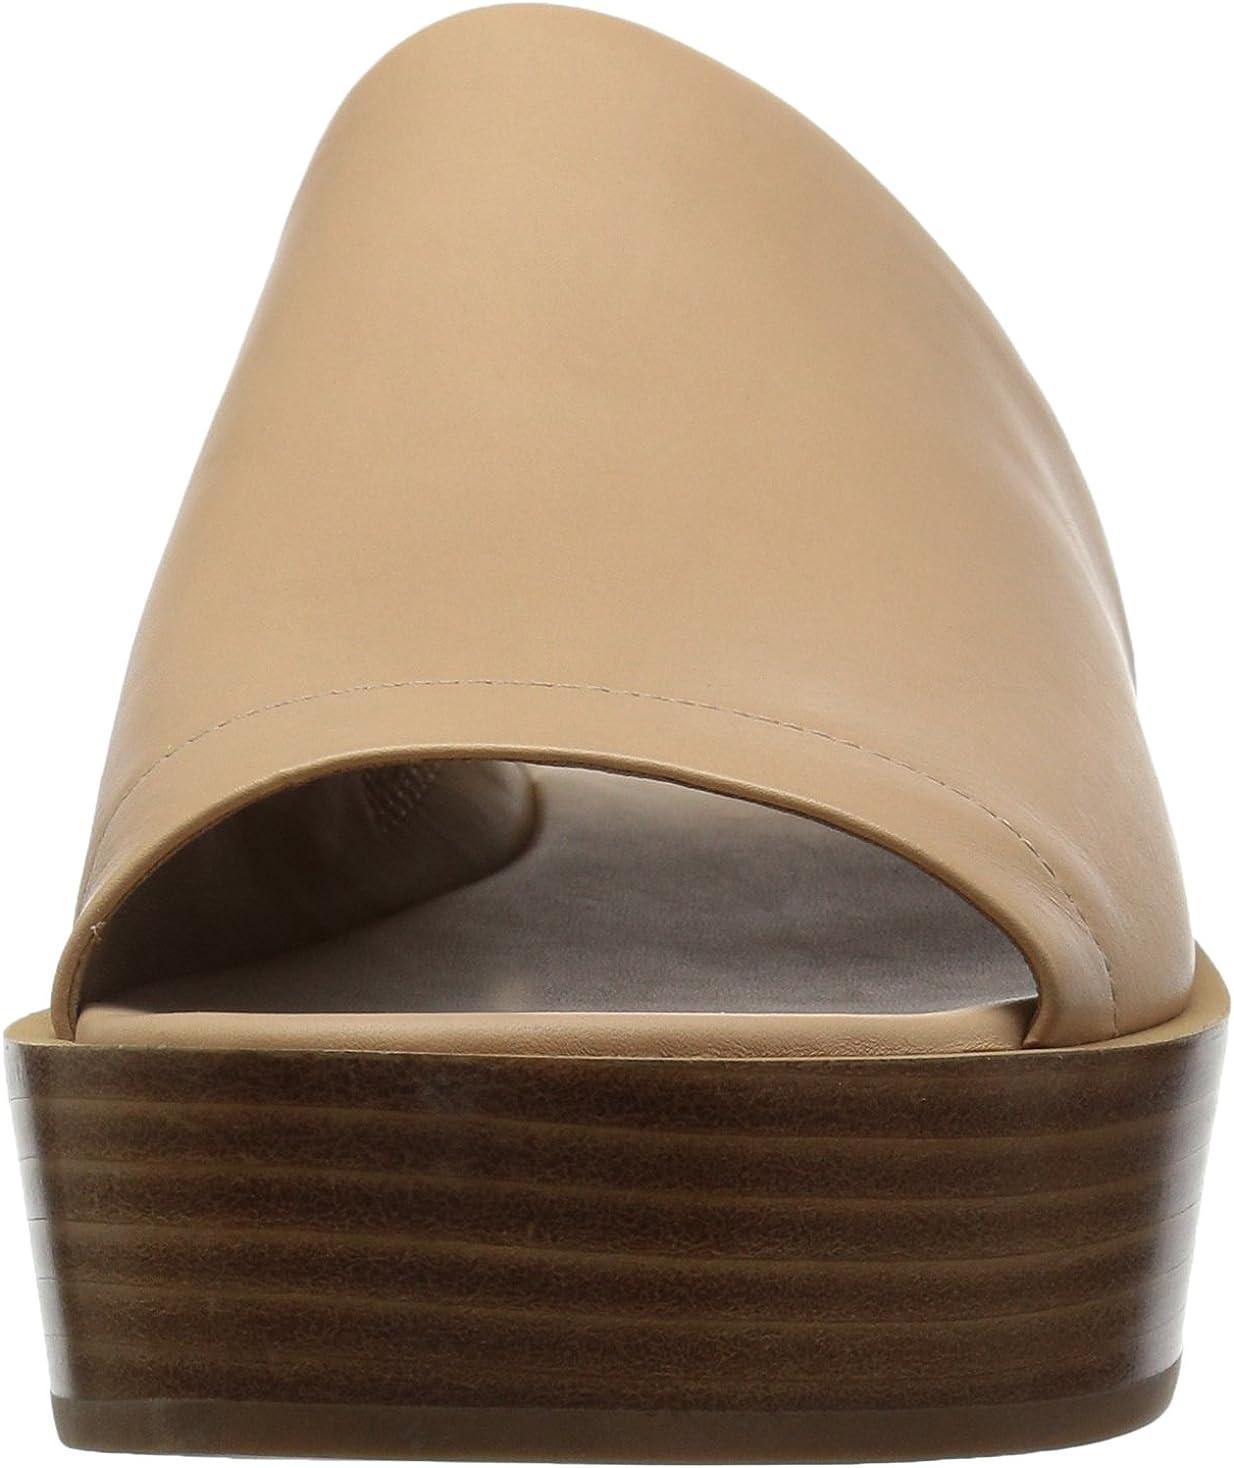 Vince Womens Saskia-B Open Toe Casual Platform Sandals